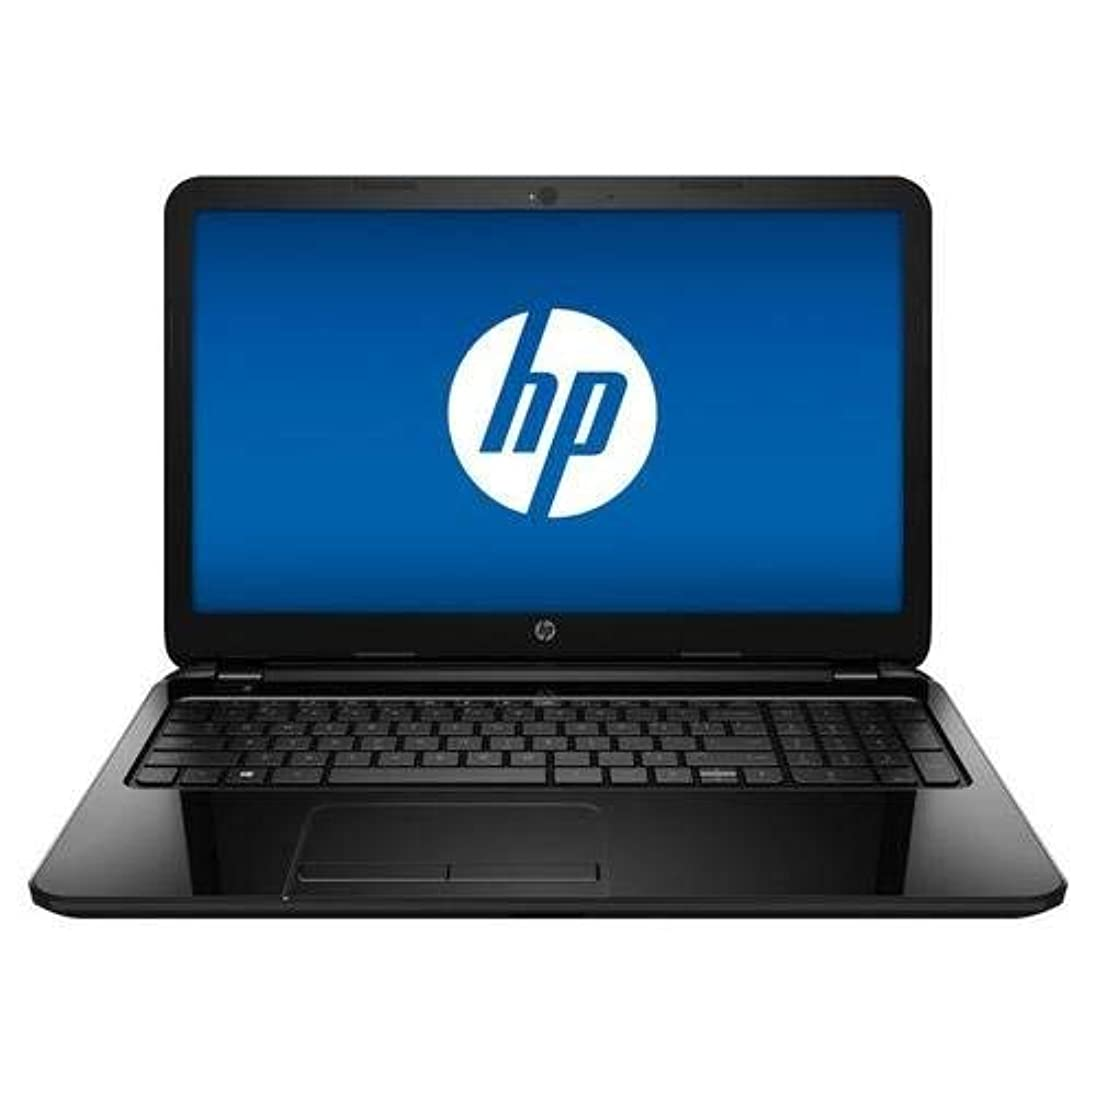 HP 15-G013CL Laptop AMD A8-6410 2GHz 4GB 750GB Windows 10 (Renewed)